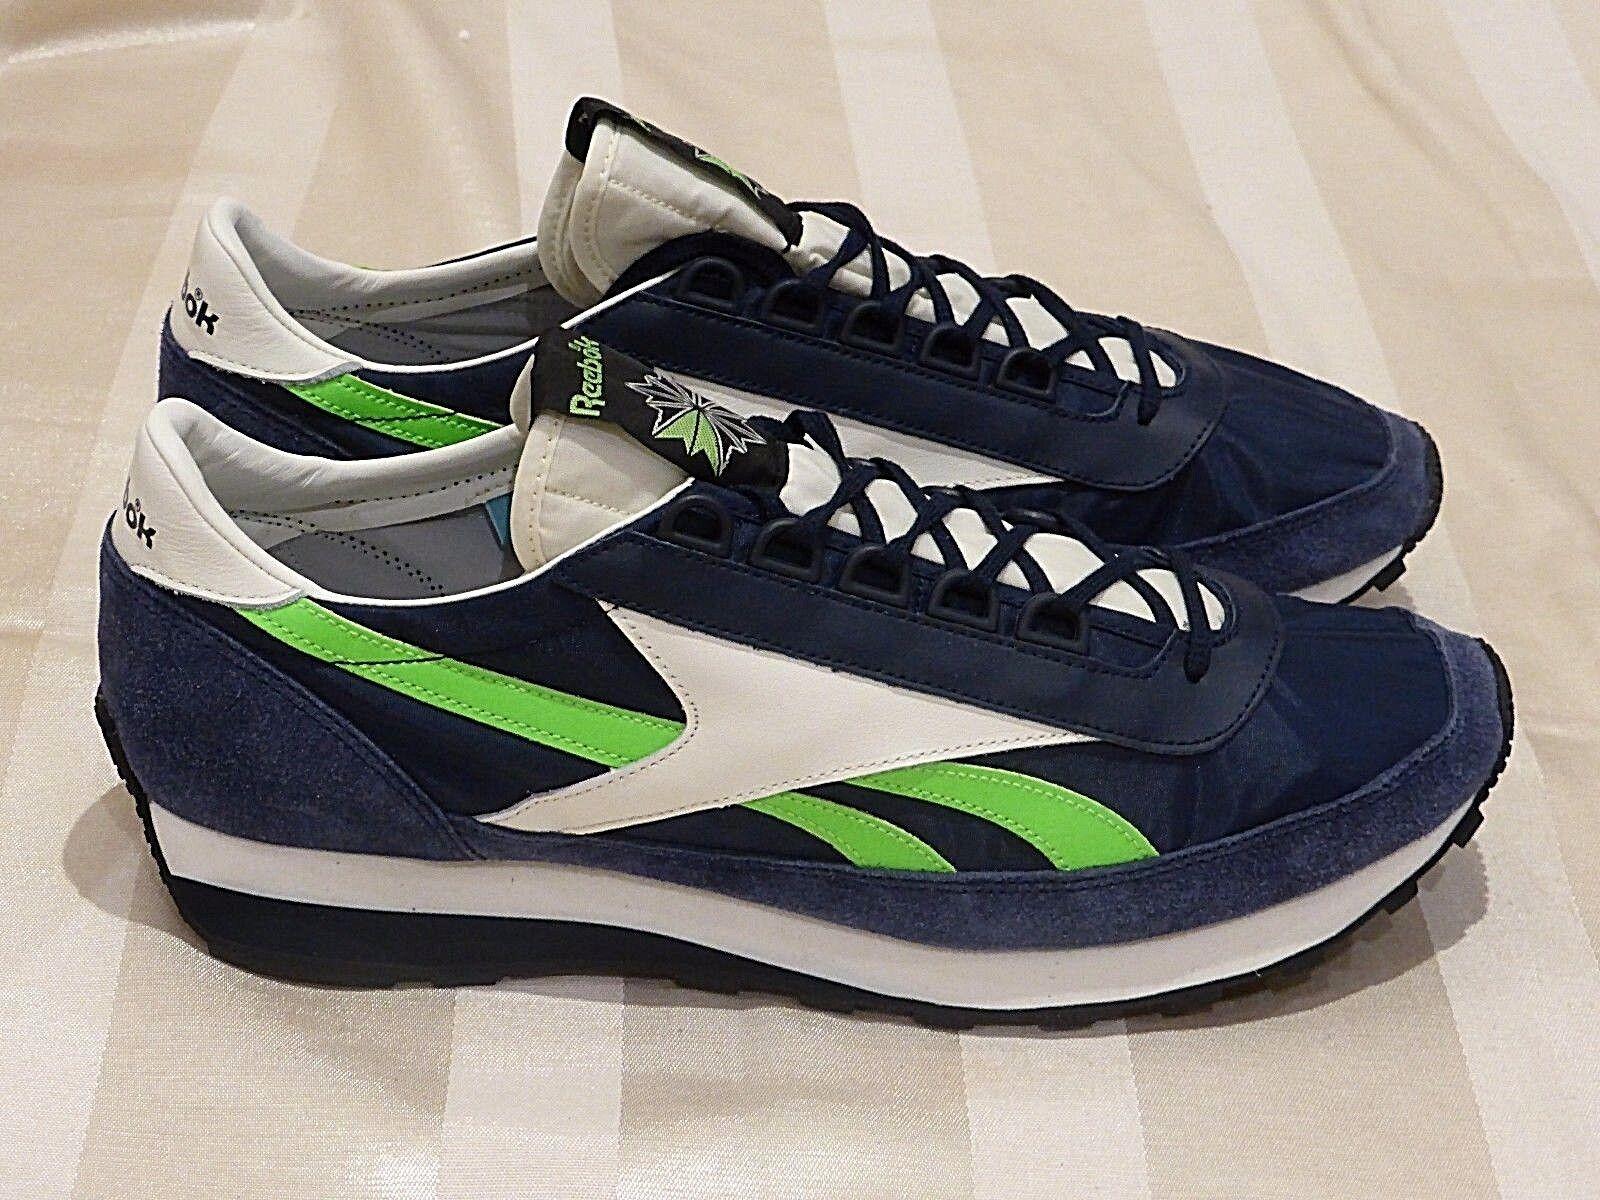 30f543de4ef52 REEBOK Aztec OG Suede 'Collegiate Navy White' Limited (12US) pump ultra air  90 omcdsj4479-Casual Shoes